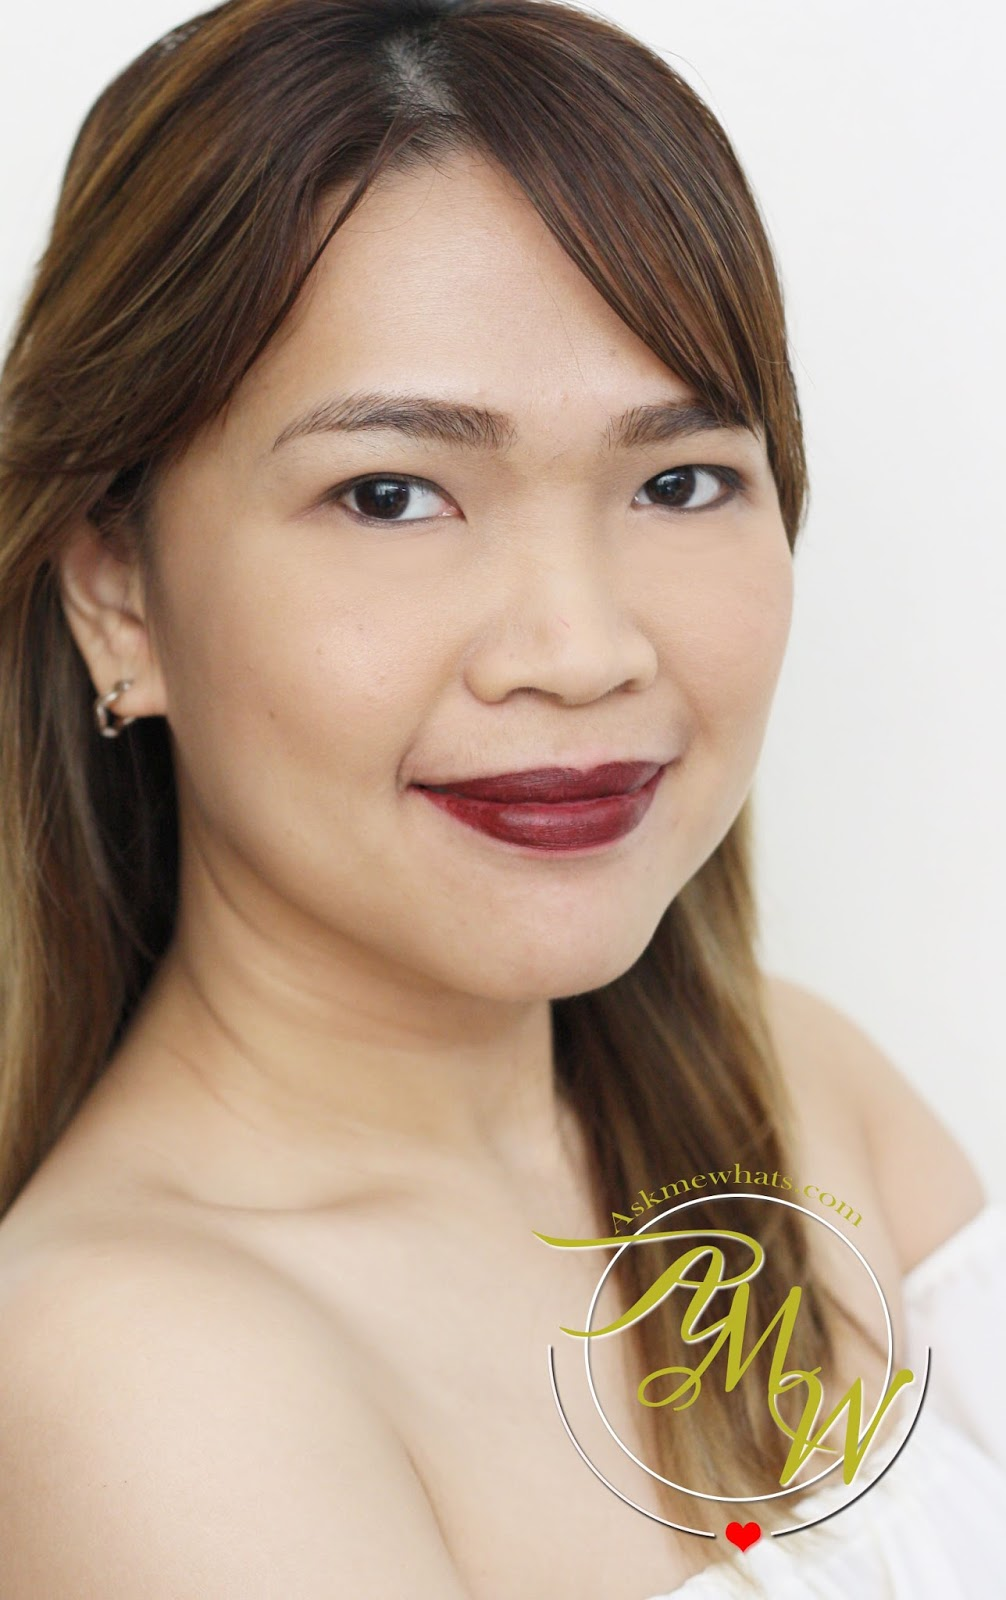 bbf9d40c6a9 a photo of Nikki Tiu AskMeWhats wearing Maybelline Creamy Matte Lipsticks  by Colorsensational Burgundy Blush.